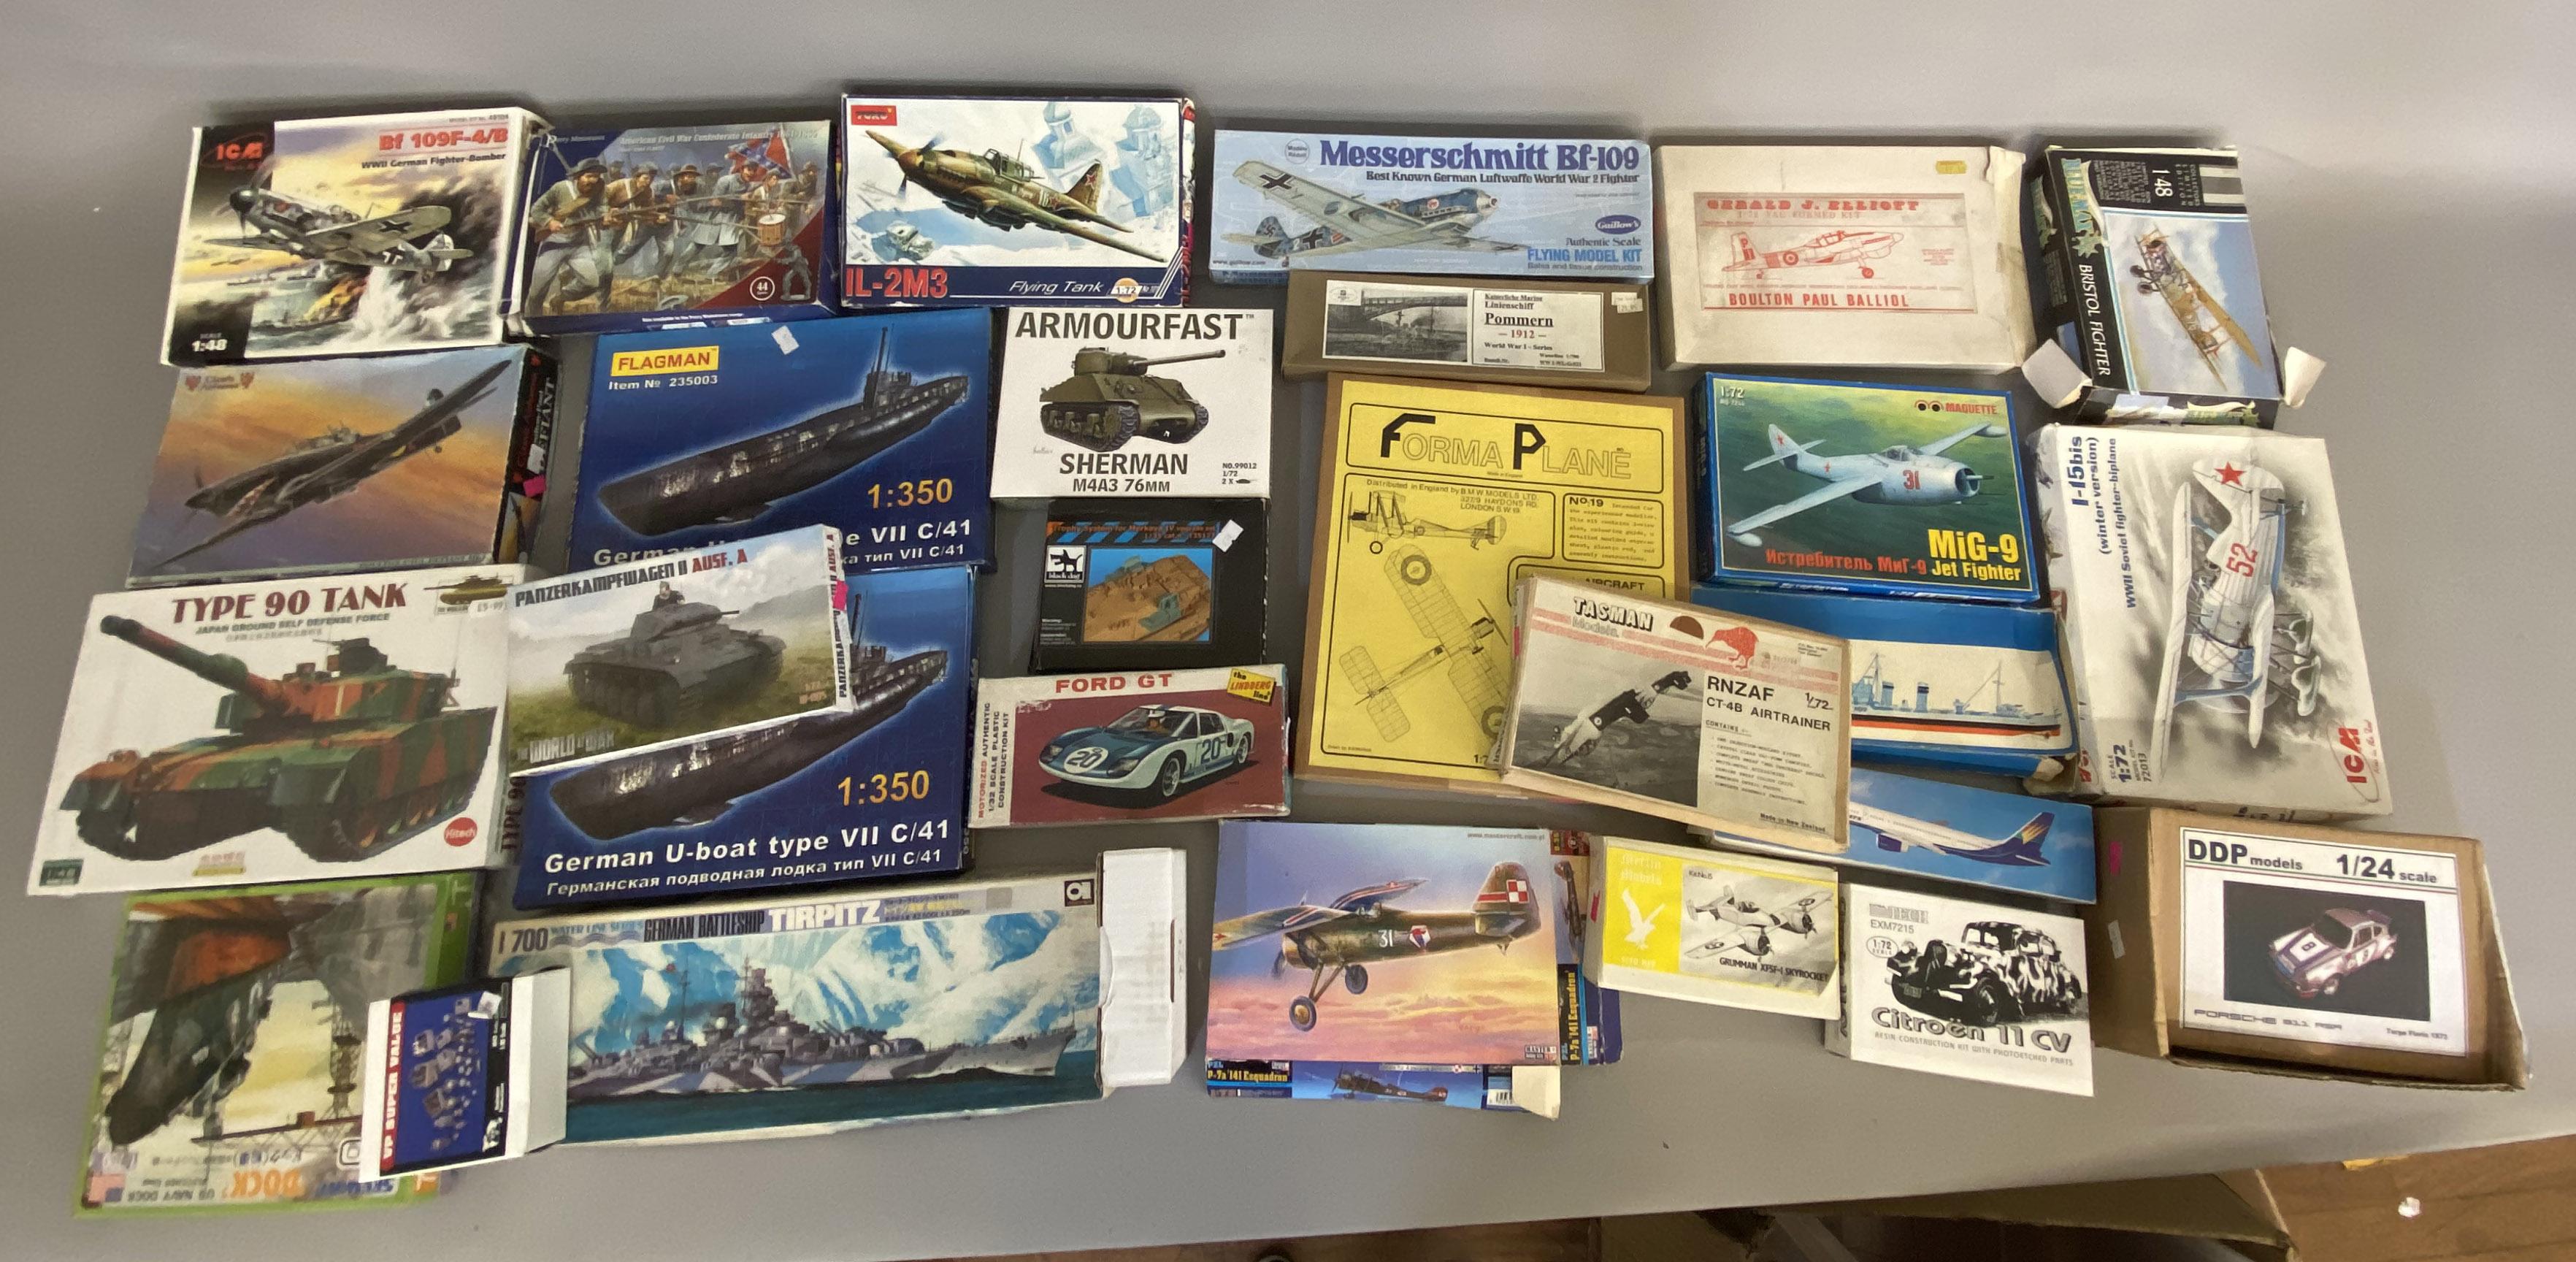 Lot 217 - EX DEALER STOCK: 29x assorted model kits including Flagman, Kitech, Maquette etc. All appear